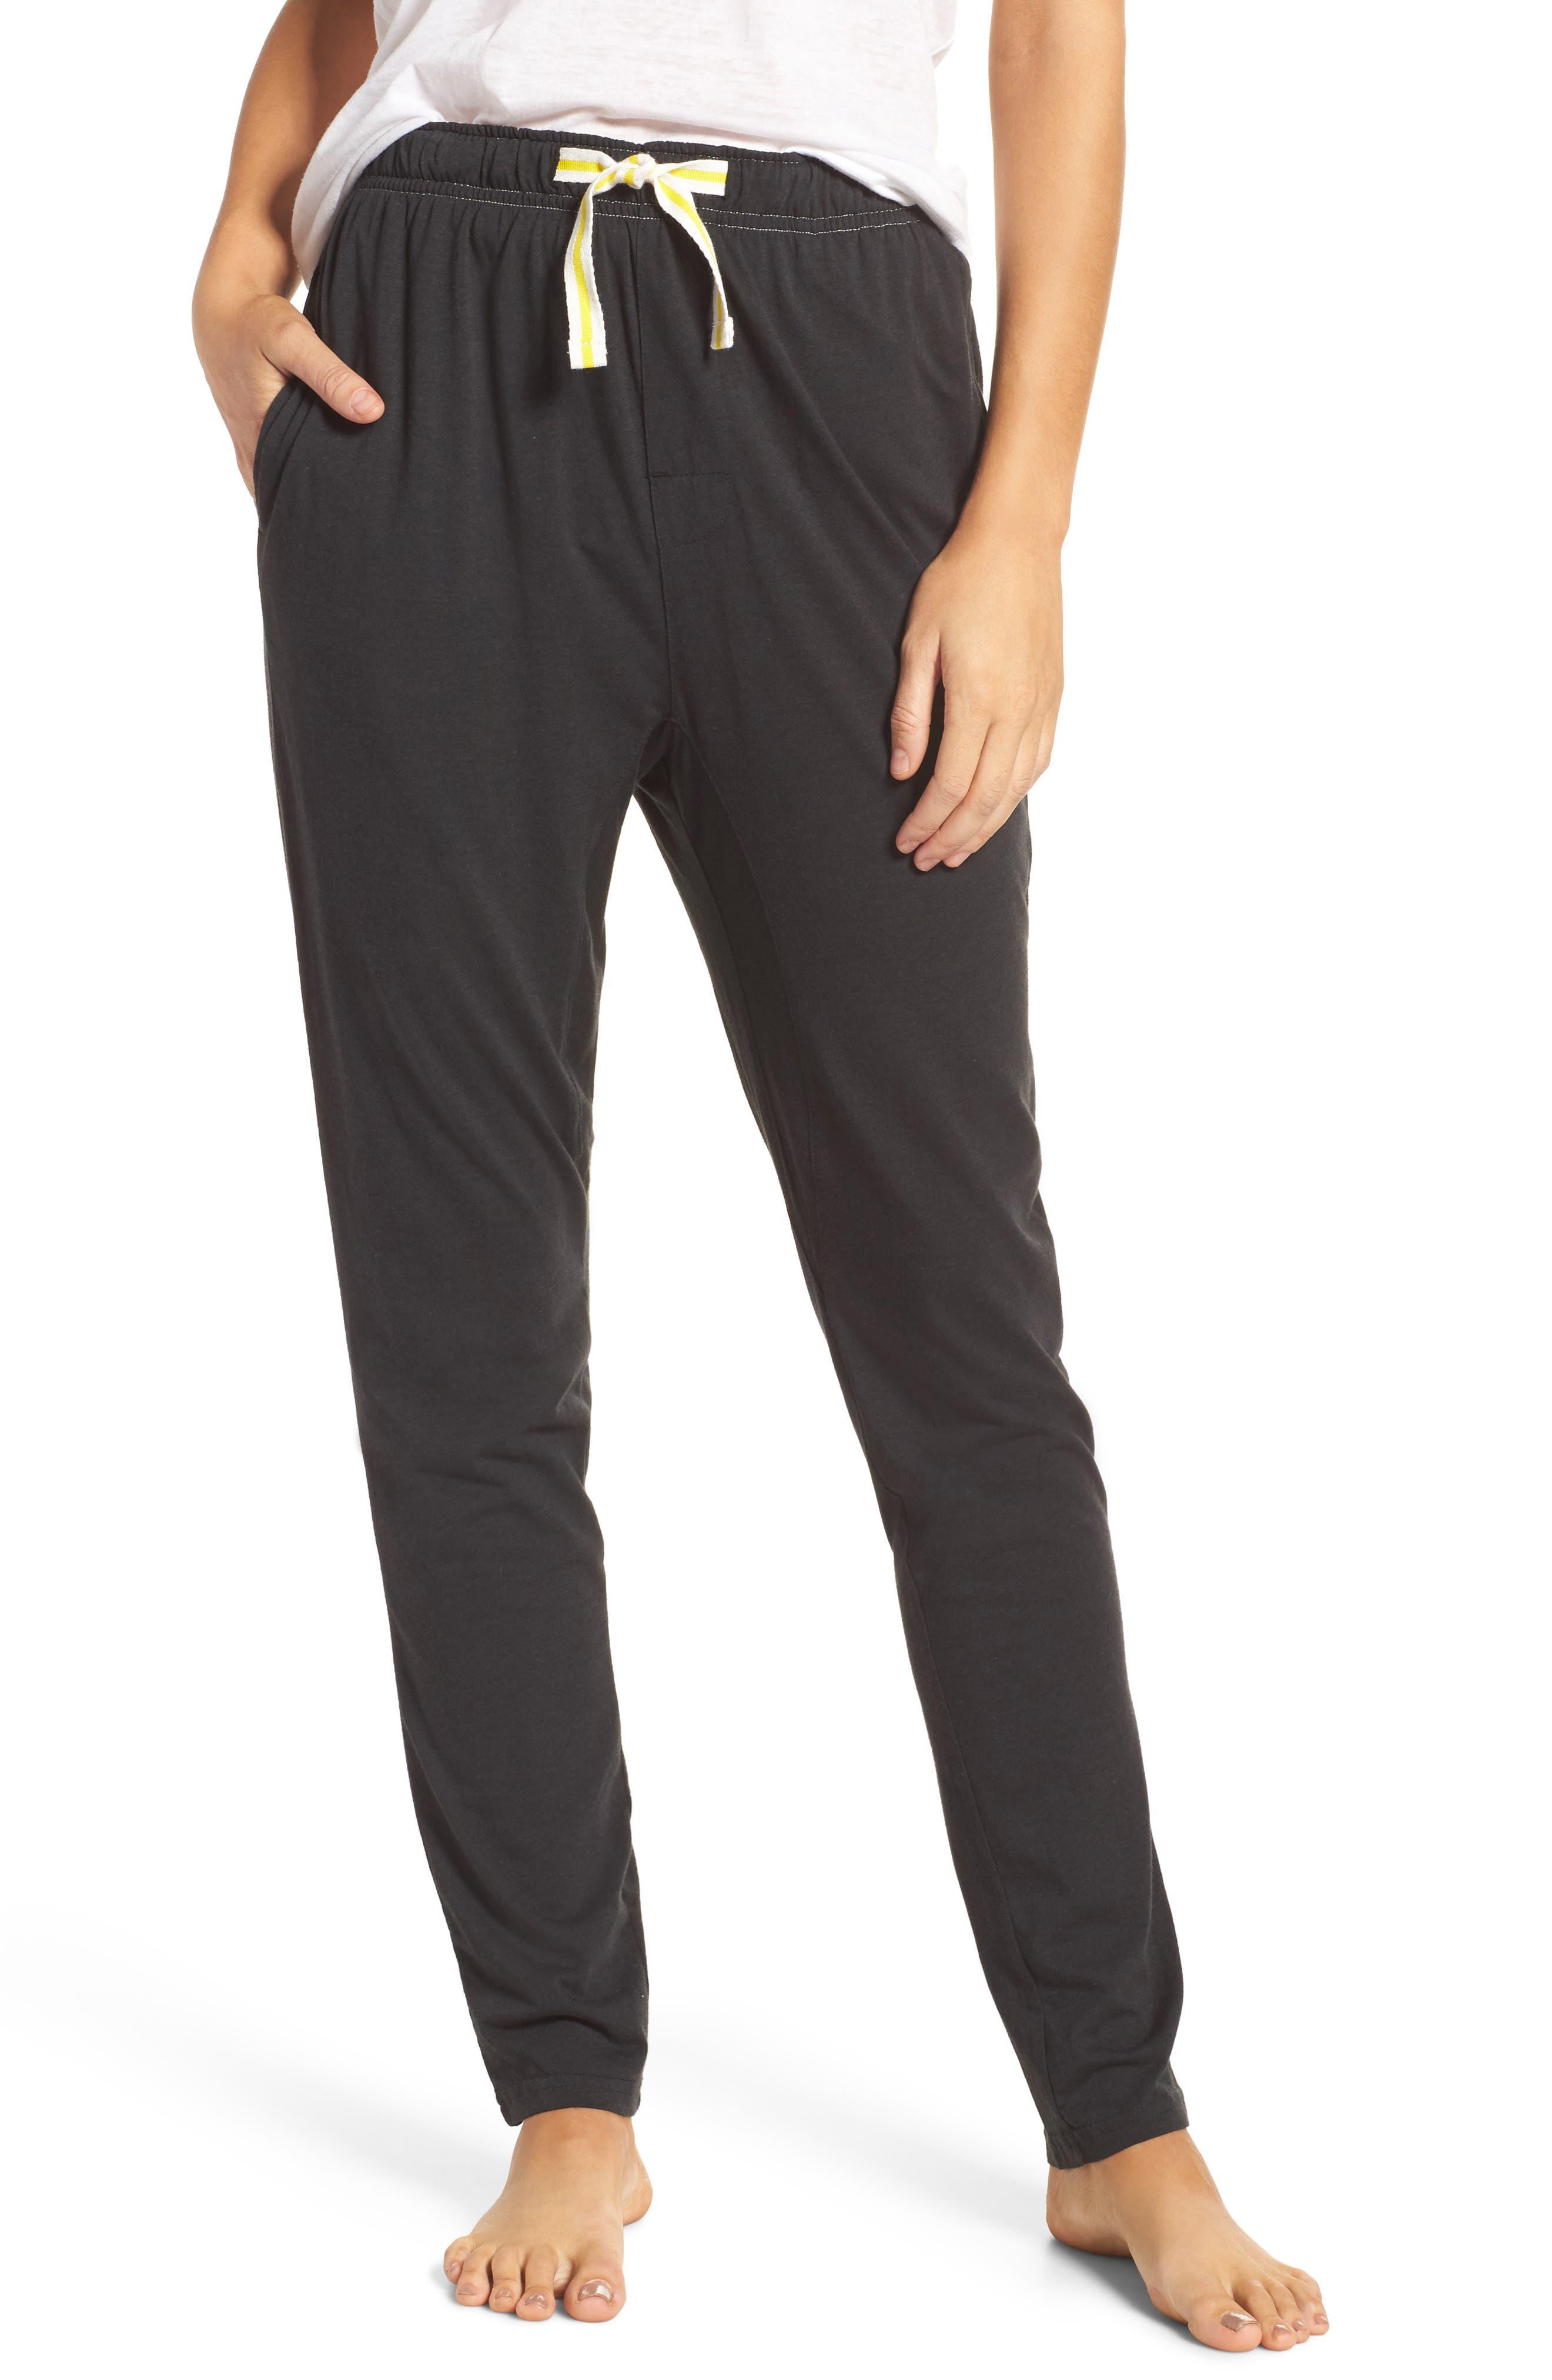 Alice Lounge Pants,                         Main,                         color, 001